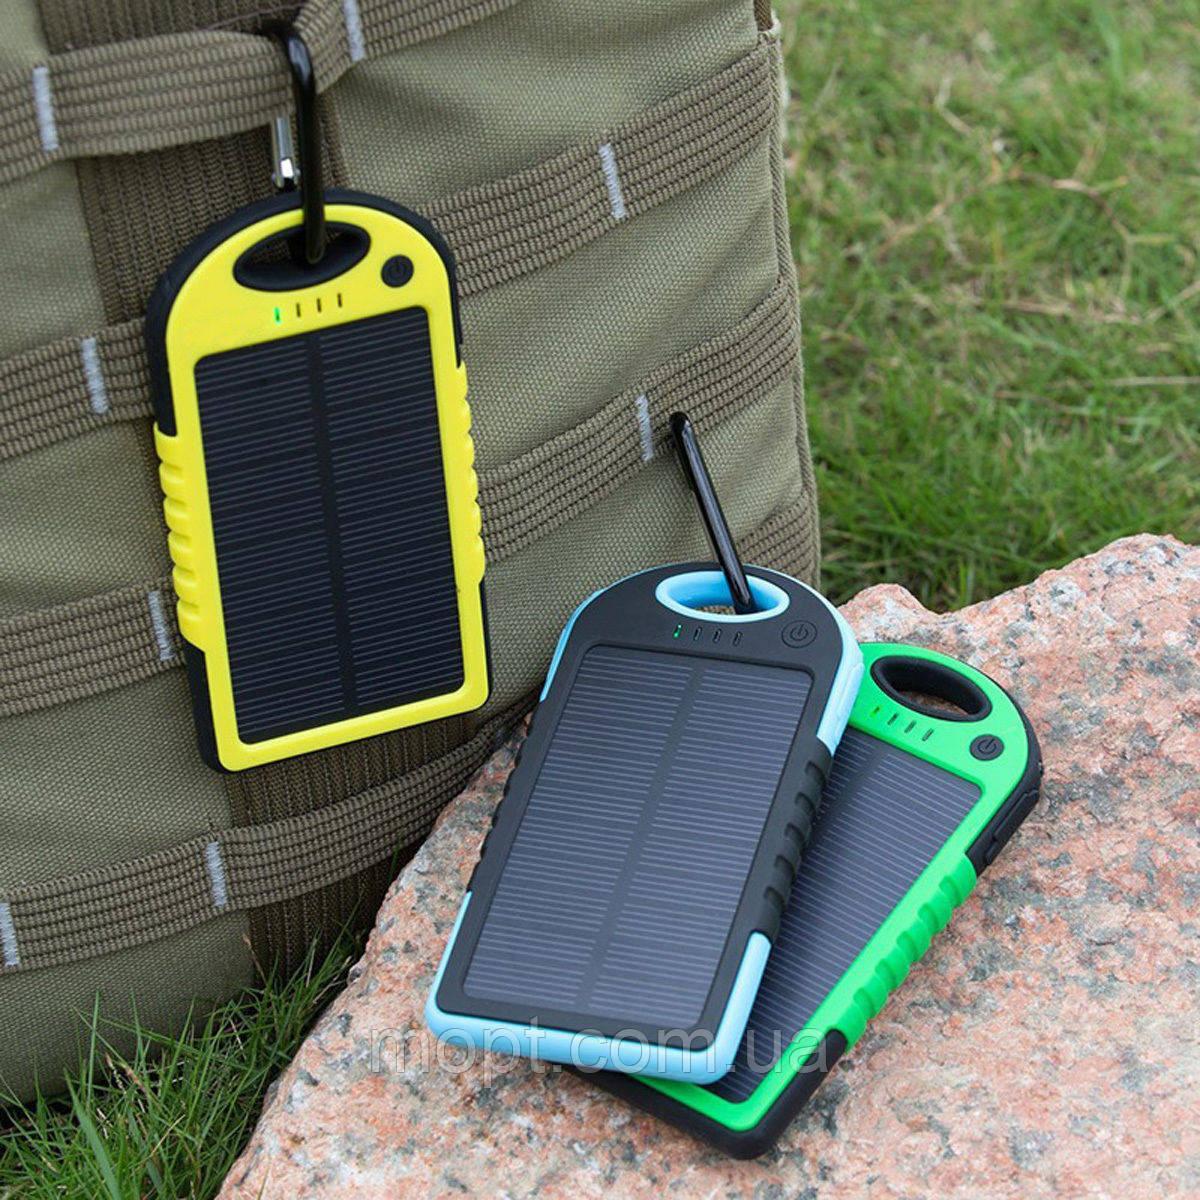 Power Bank 10000 mAh  солнечный Аккумулятор внешний Аккумулятор батарея